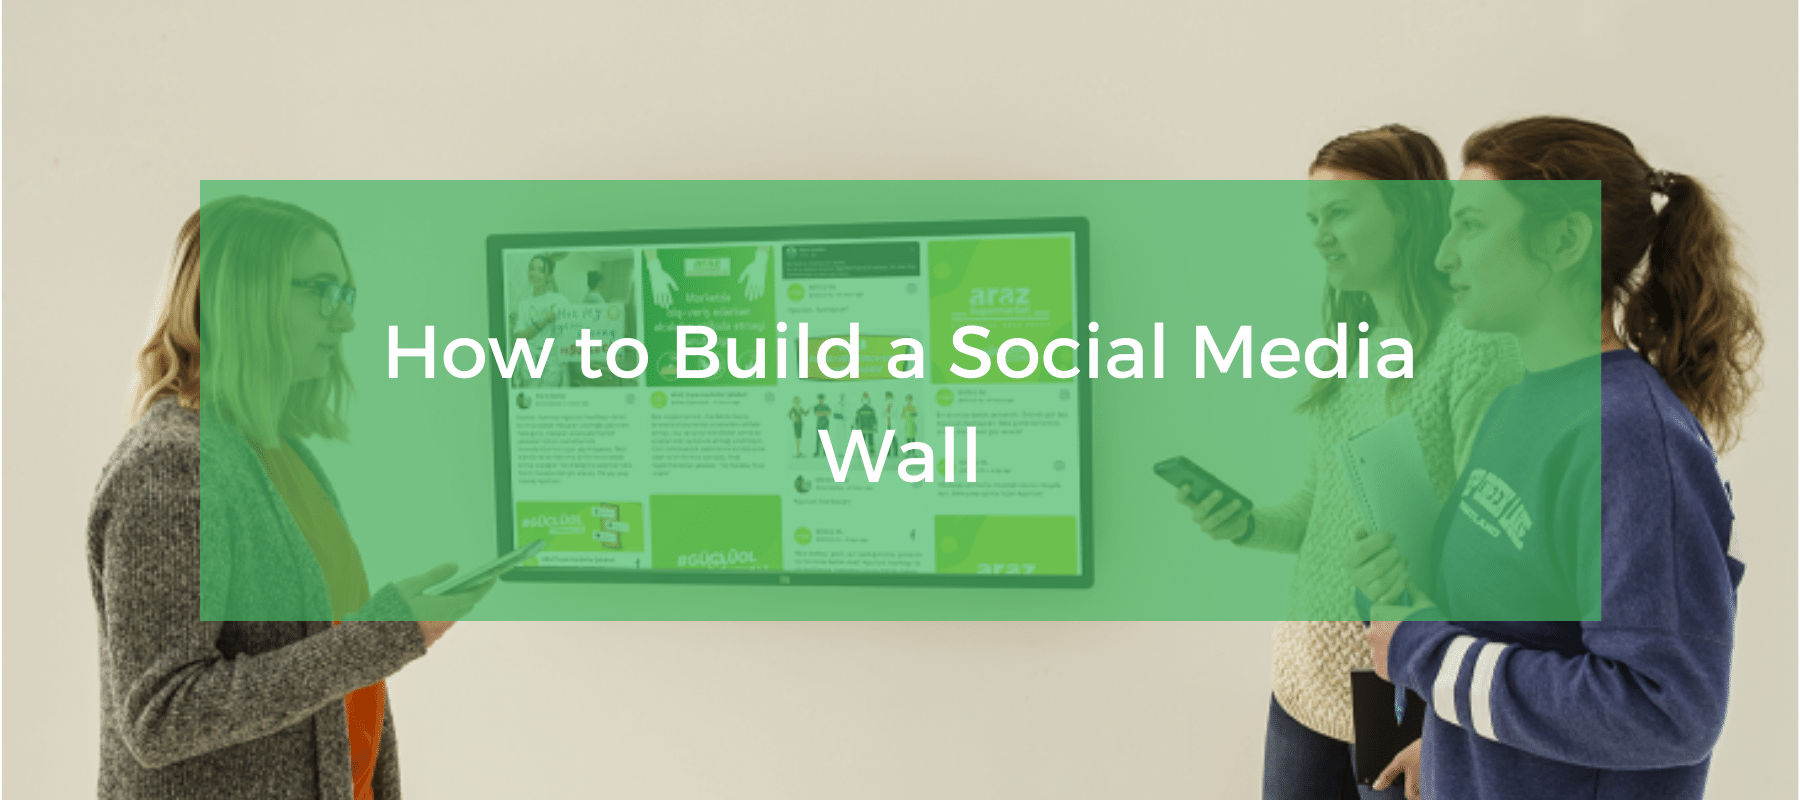 How to Build a Social Media Wall